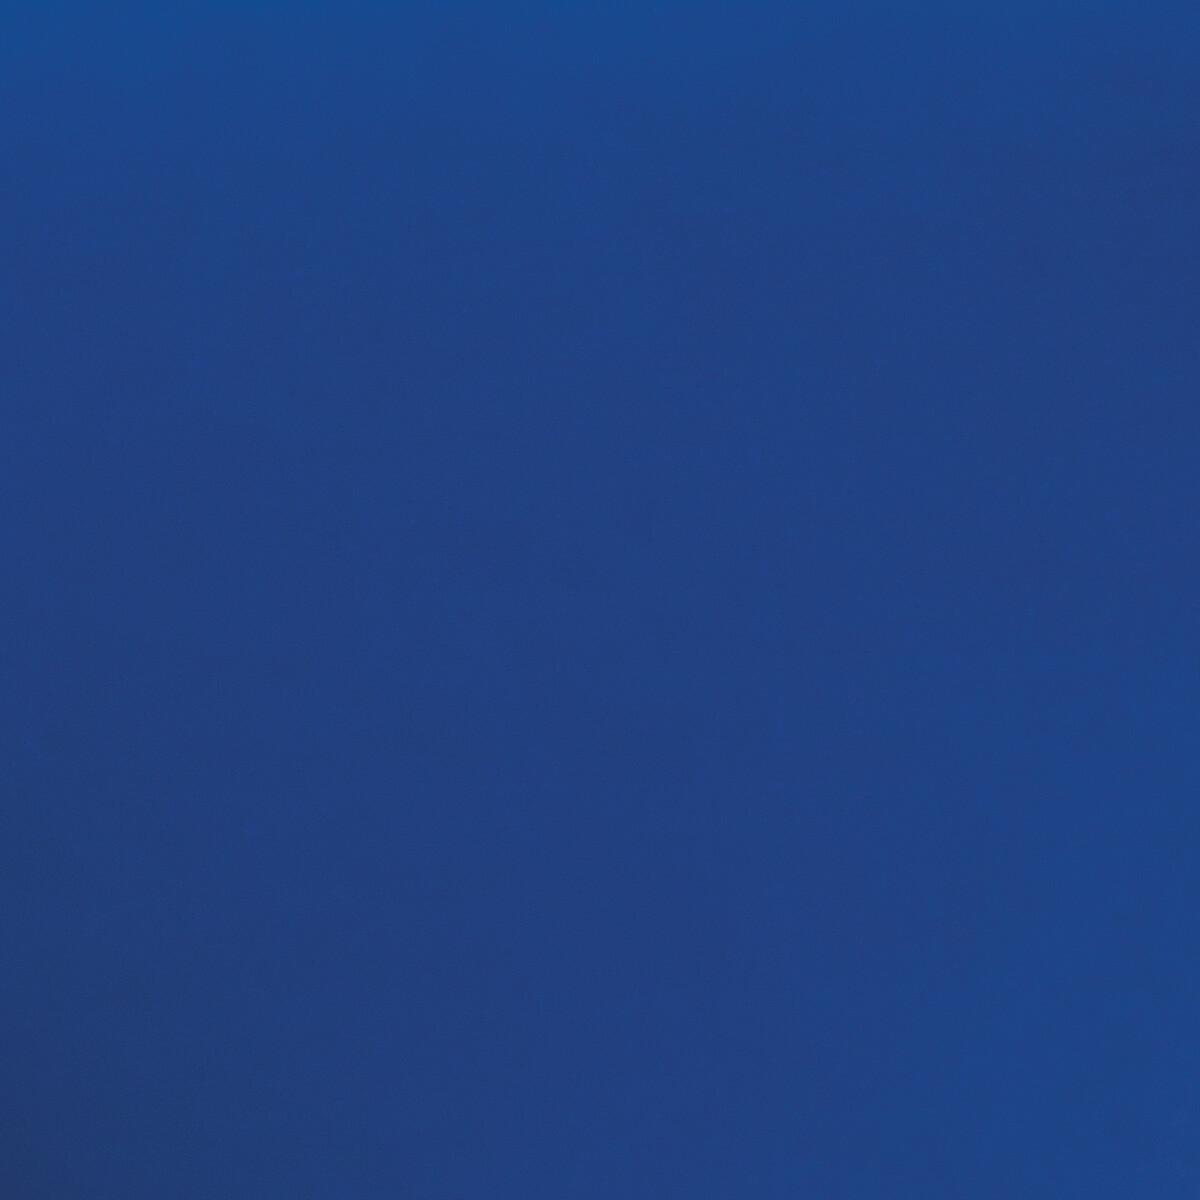 Vivid Blue Hotmark Revolution HTV - Large Roll